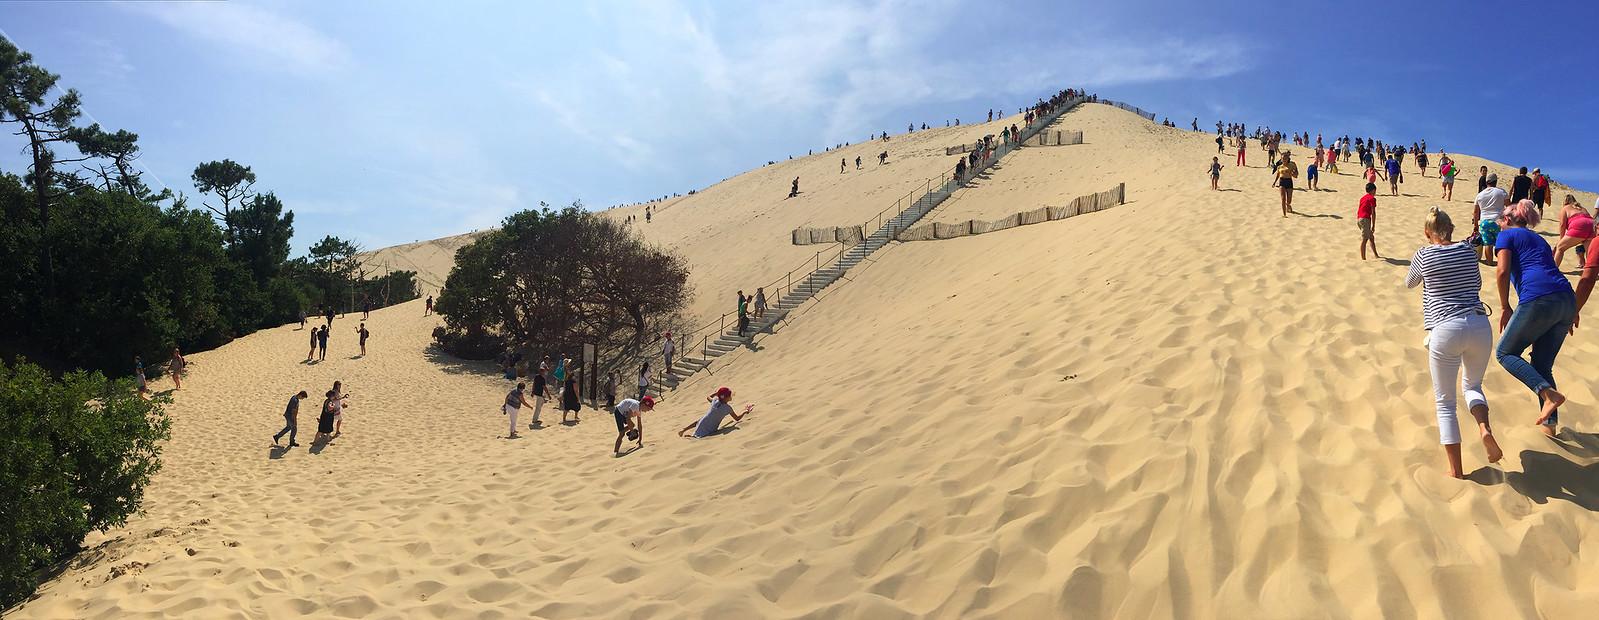 Dune du Pilat, Francia dune du pilat - 31094142127 8adbcec61b h - Dune du Pilat, la duna de arena más alta de Europa